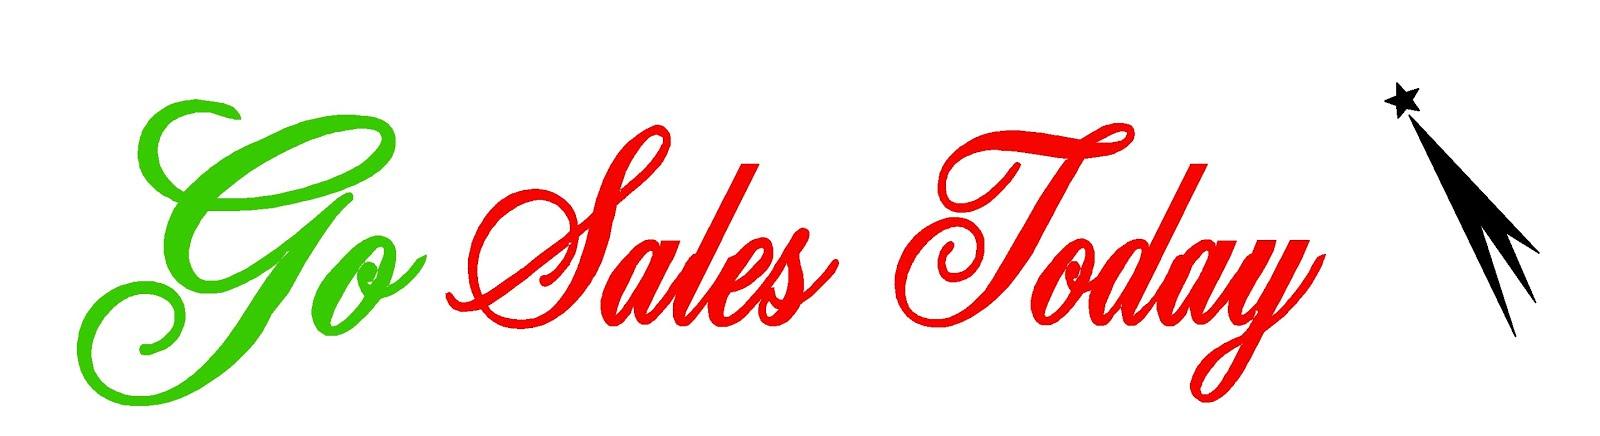 Go Sales Today